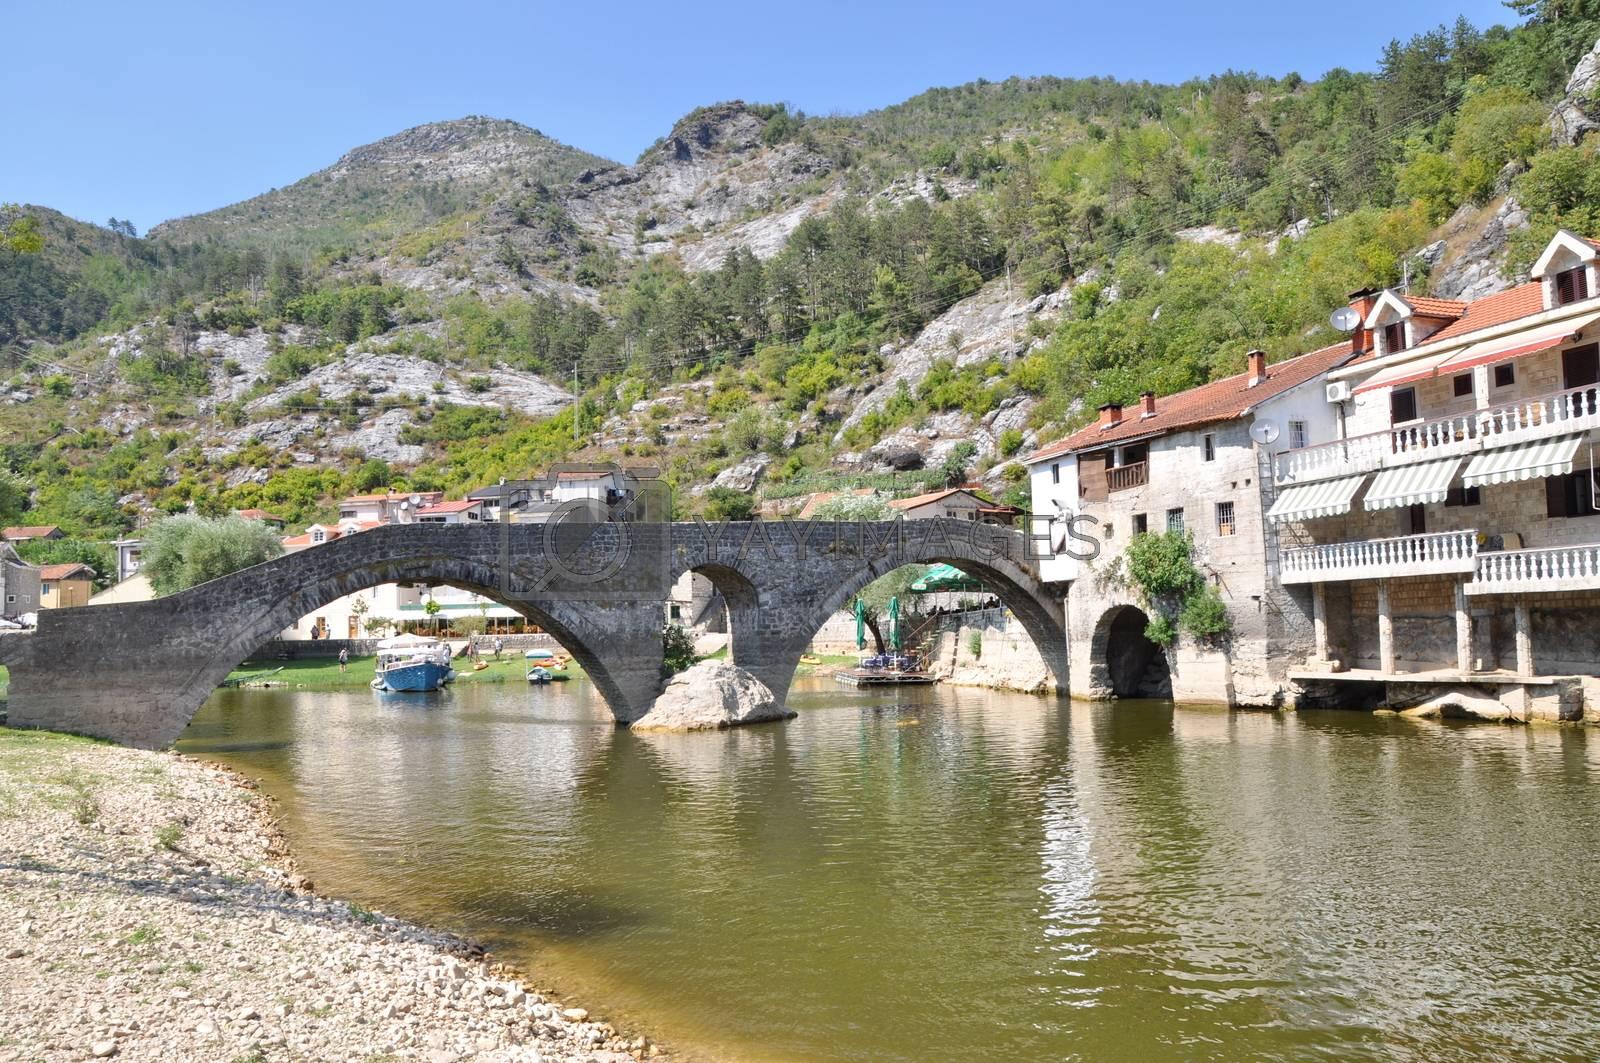 Rijeka Crnojevica in Monte Negro